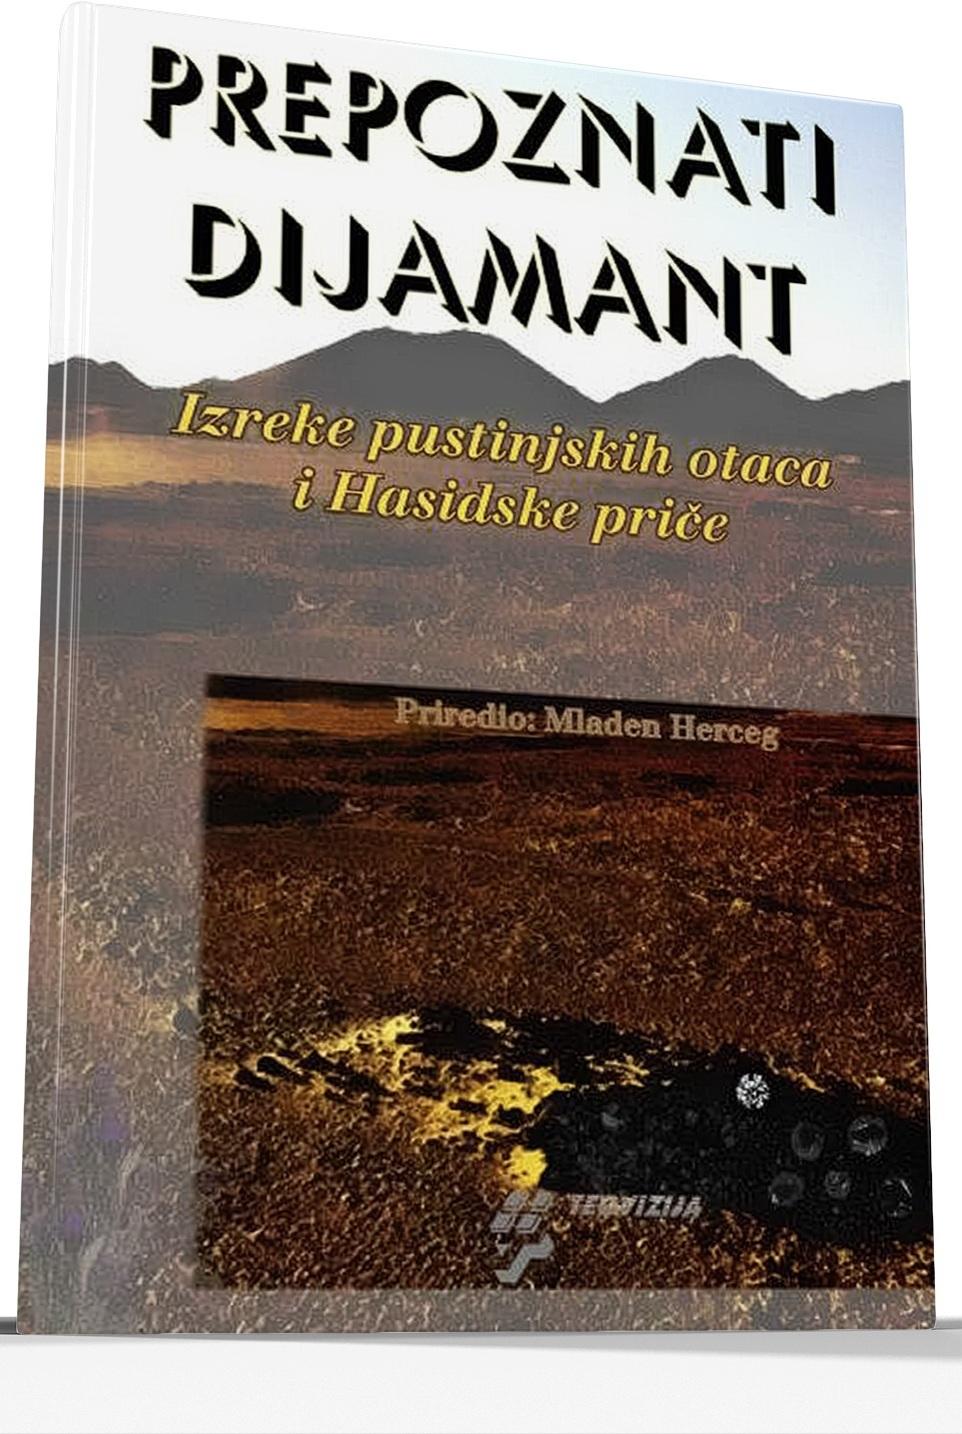 Prepoznati dijamant  by  Mladen Herceg